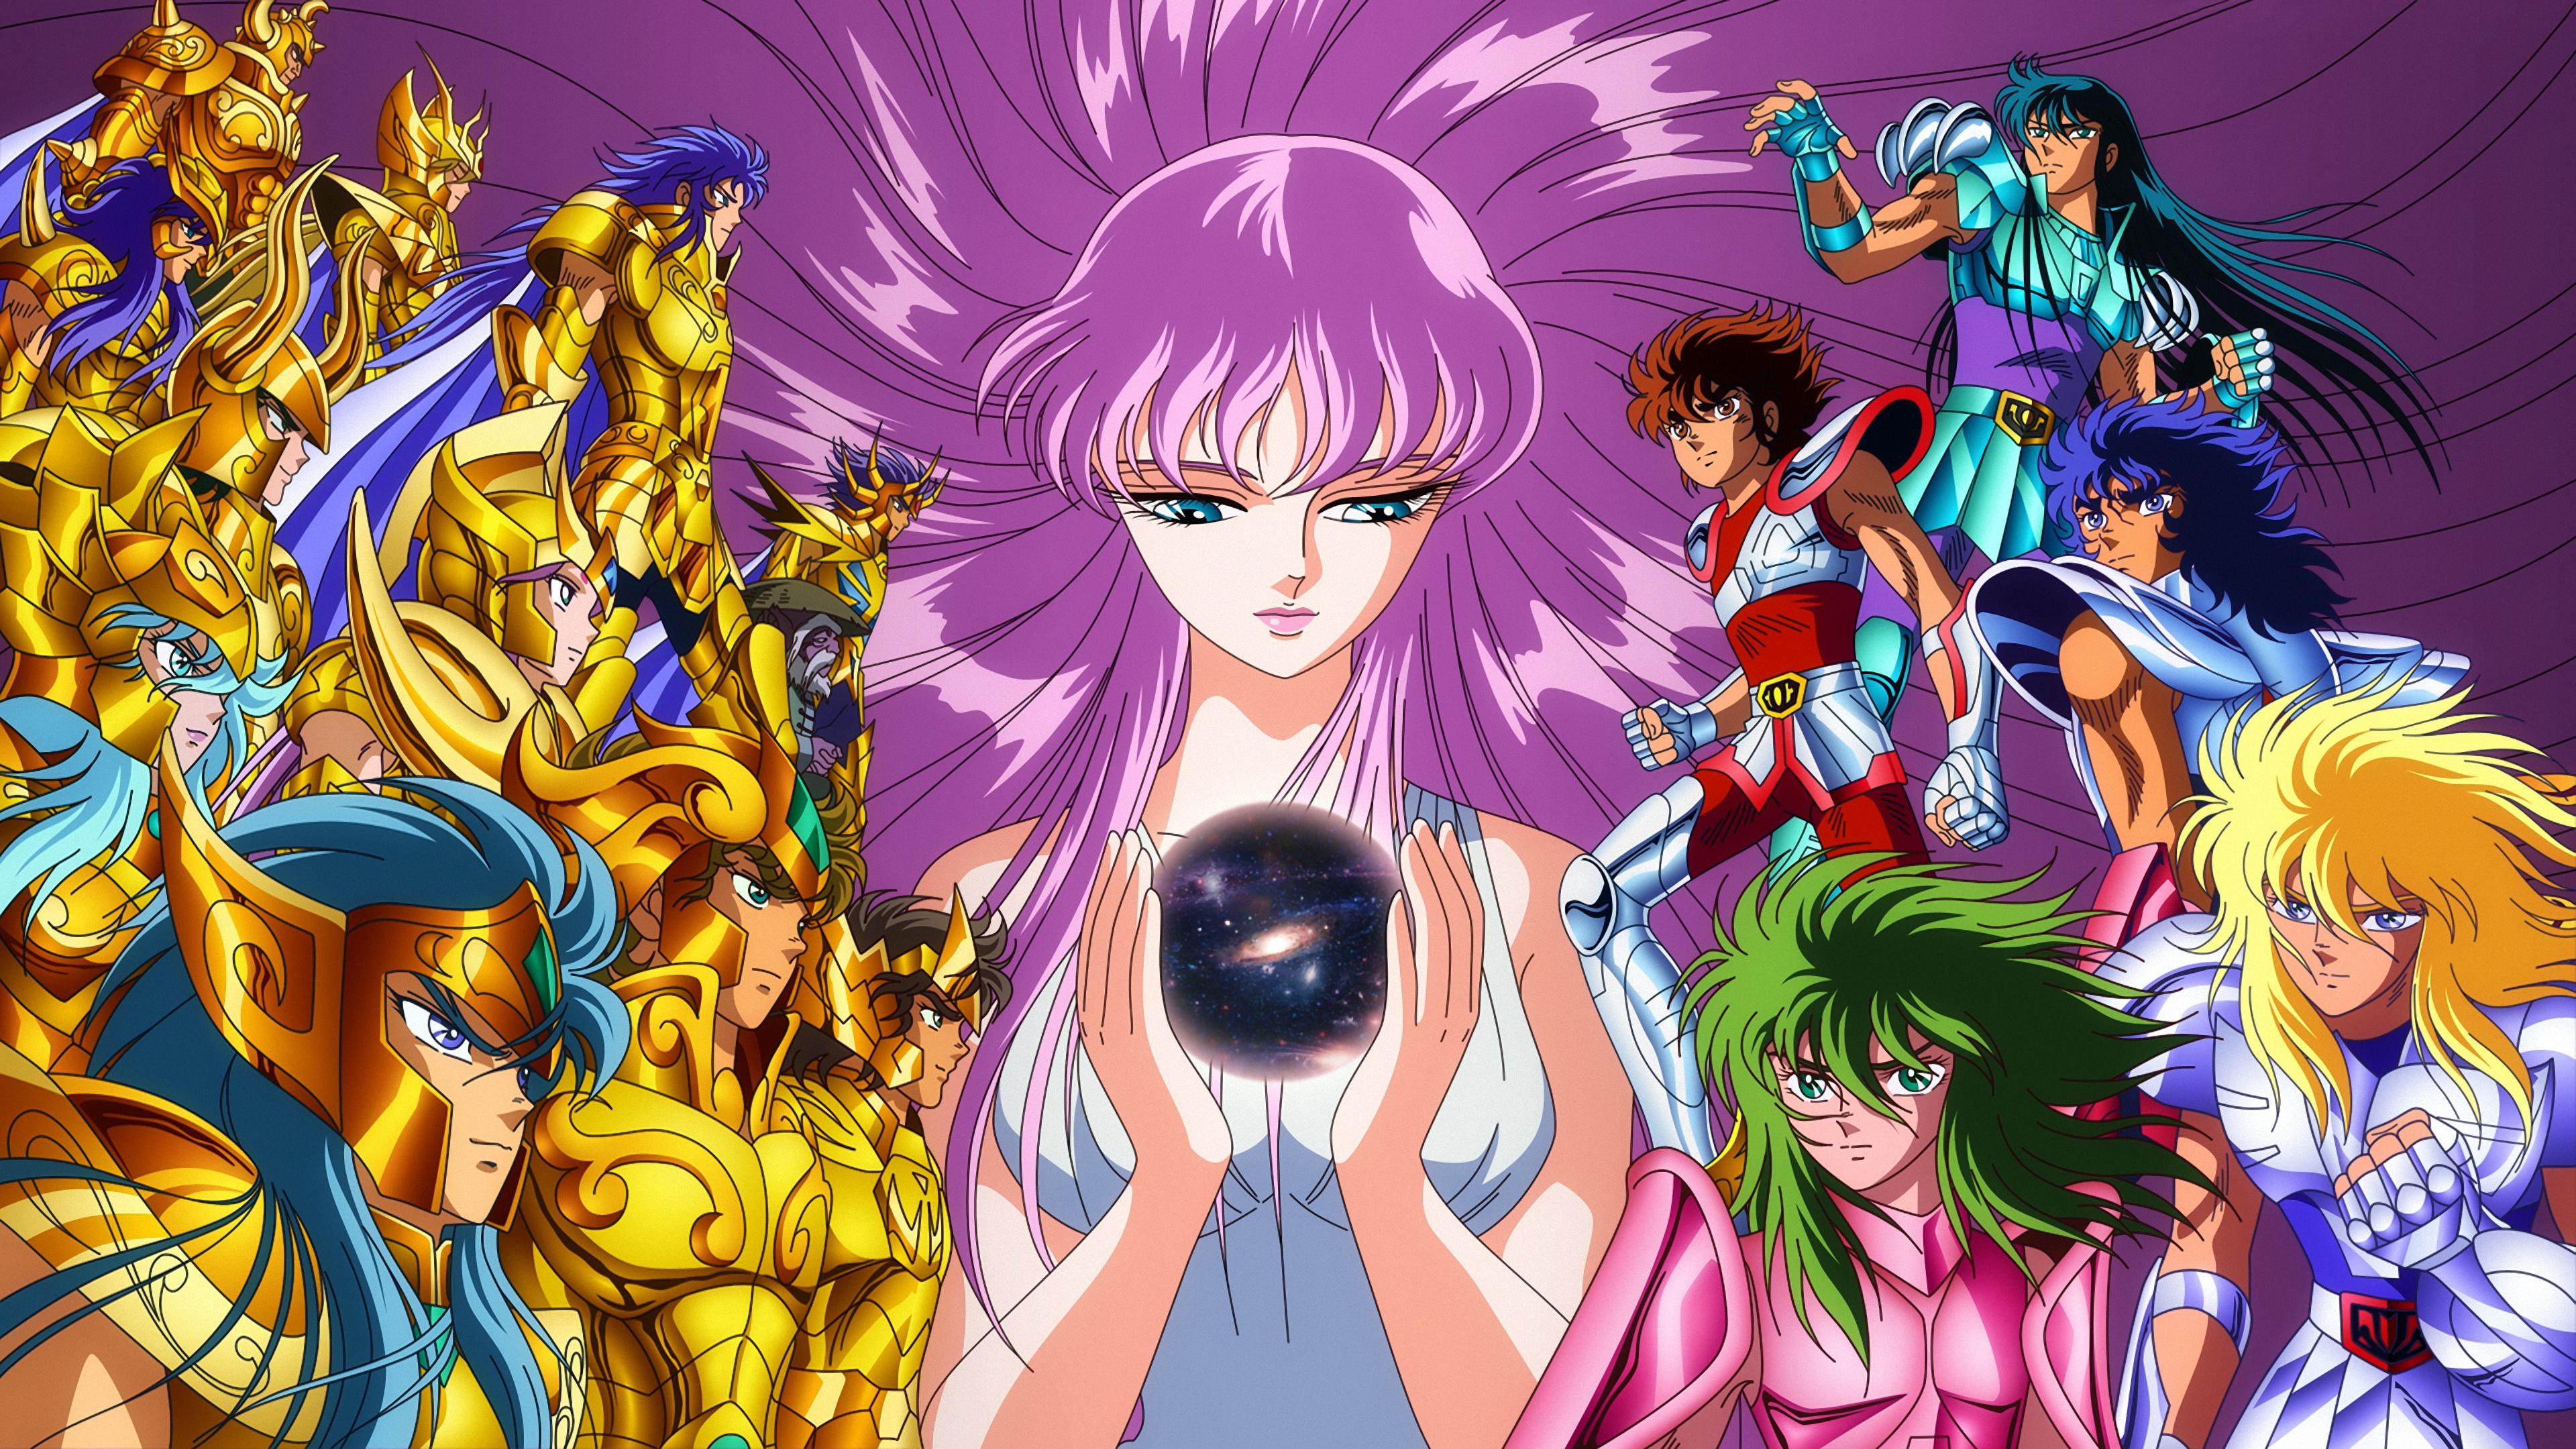 Anime 3840x2160 Saint Seiya Saori Kido anime digital art 2D artwork